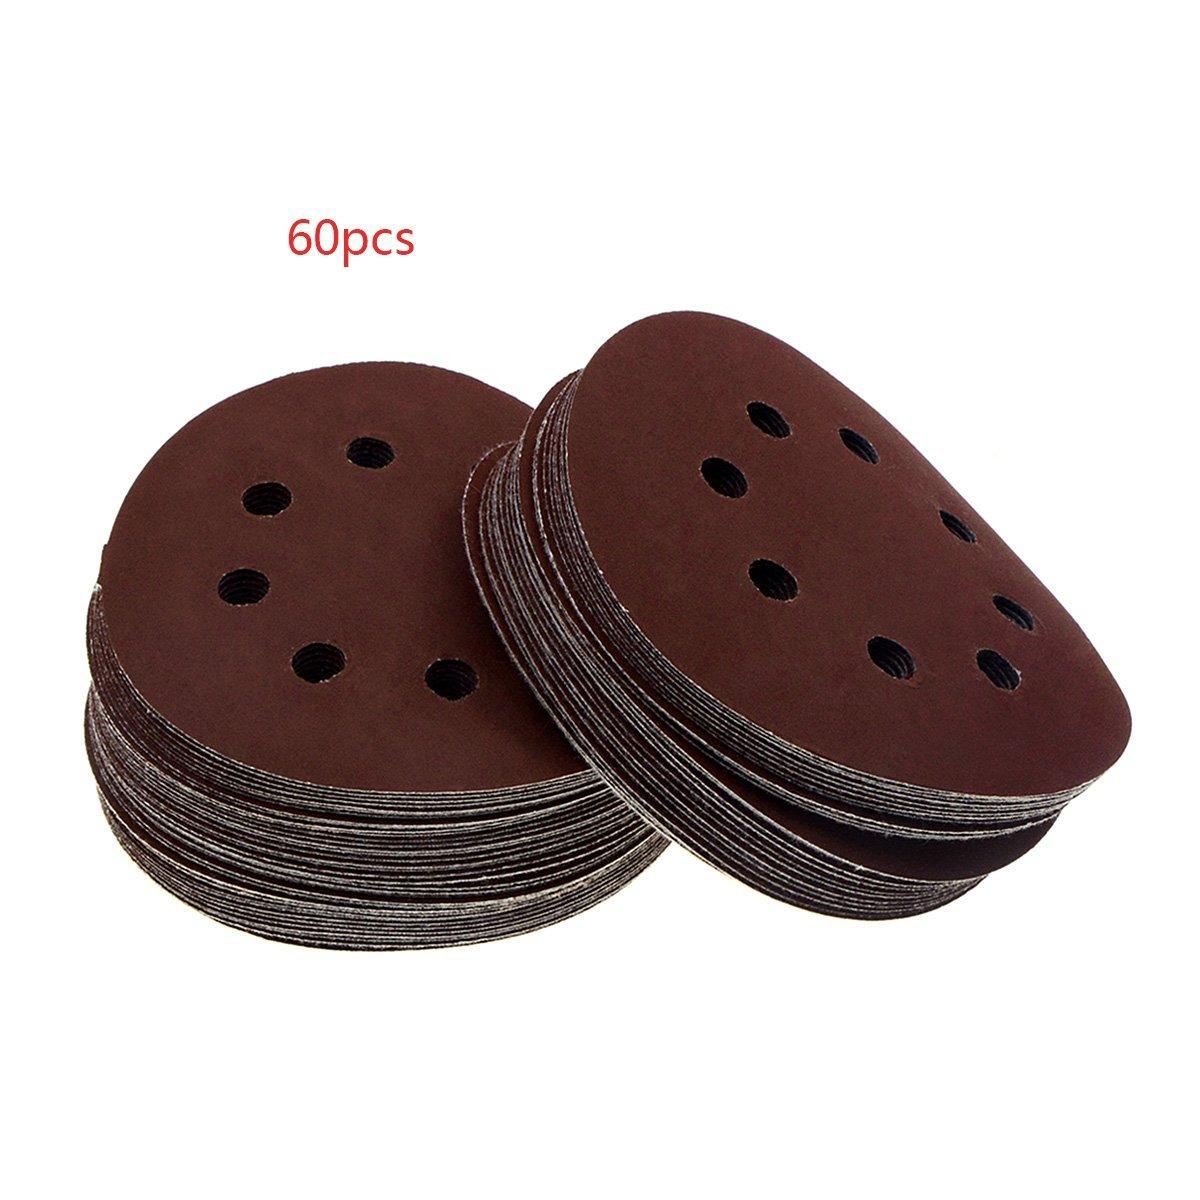 YXQ 60Pcs 5-inch 8-Hole Hook and Loop 800Grit Sanding Discs Sandpaper